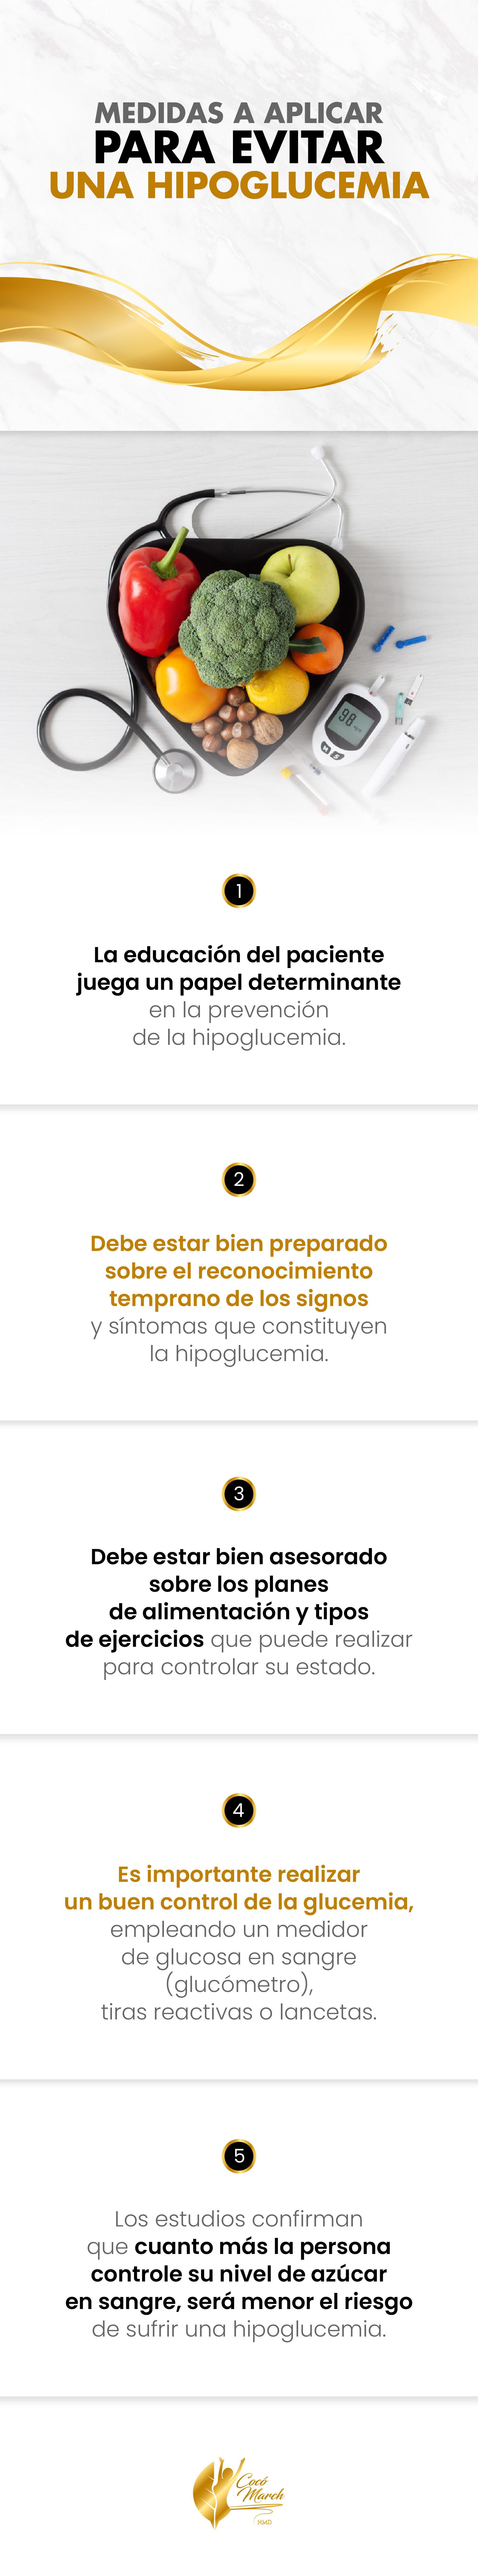 Medidas-a-aplicar-para-evitar-una-hipoglucemia